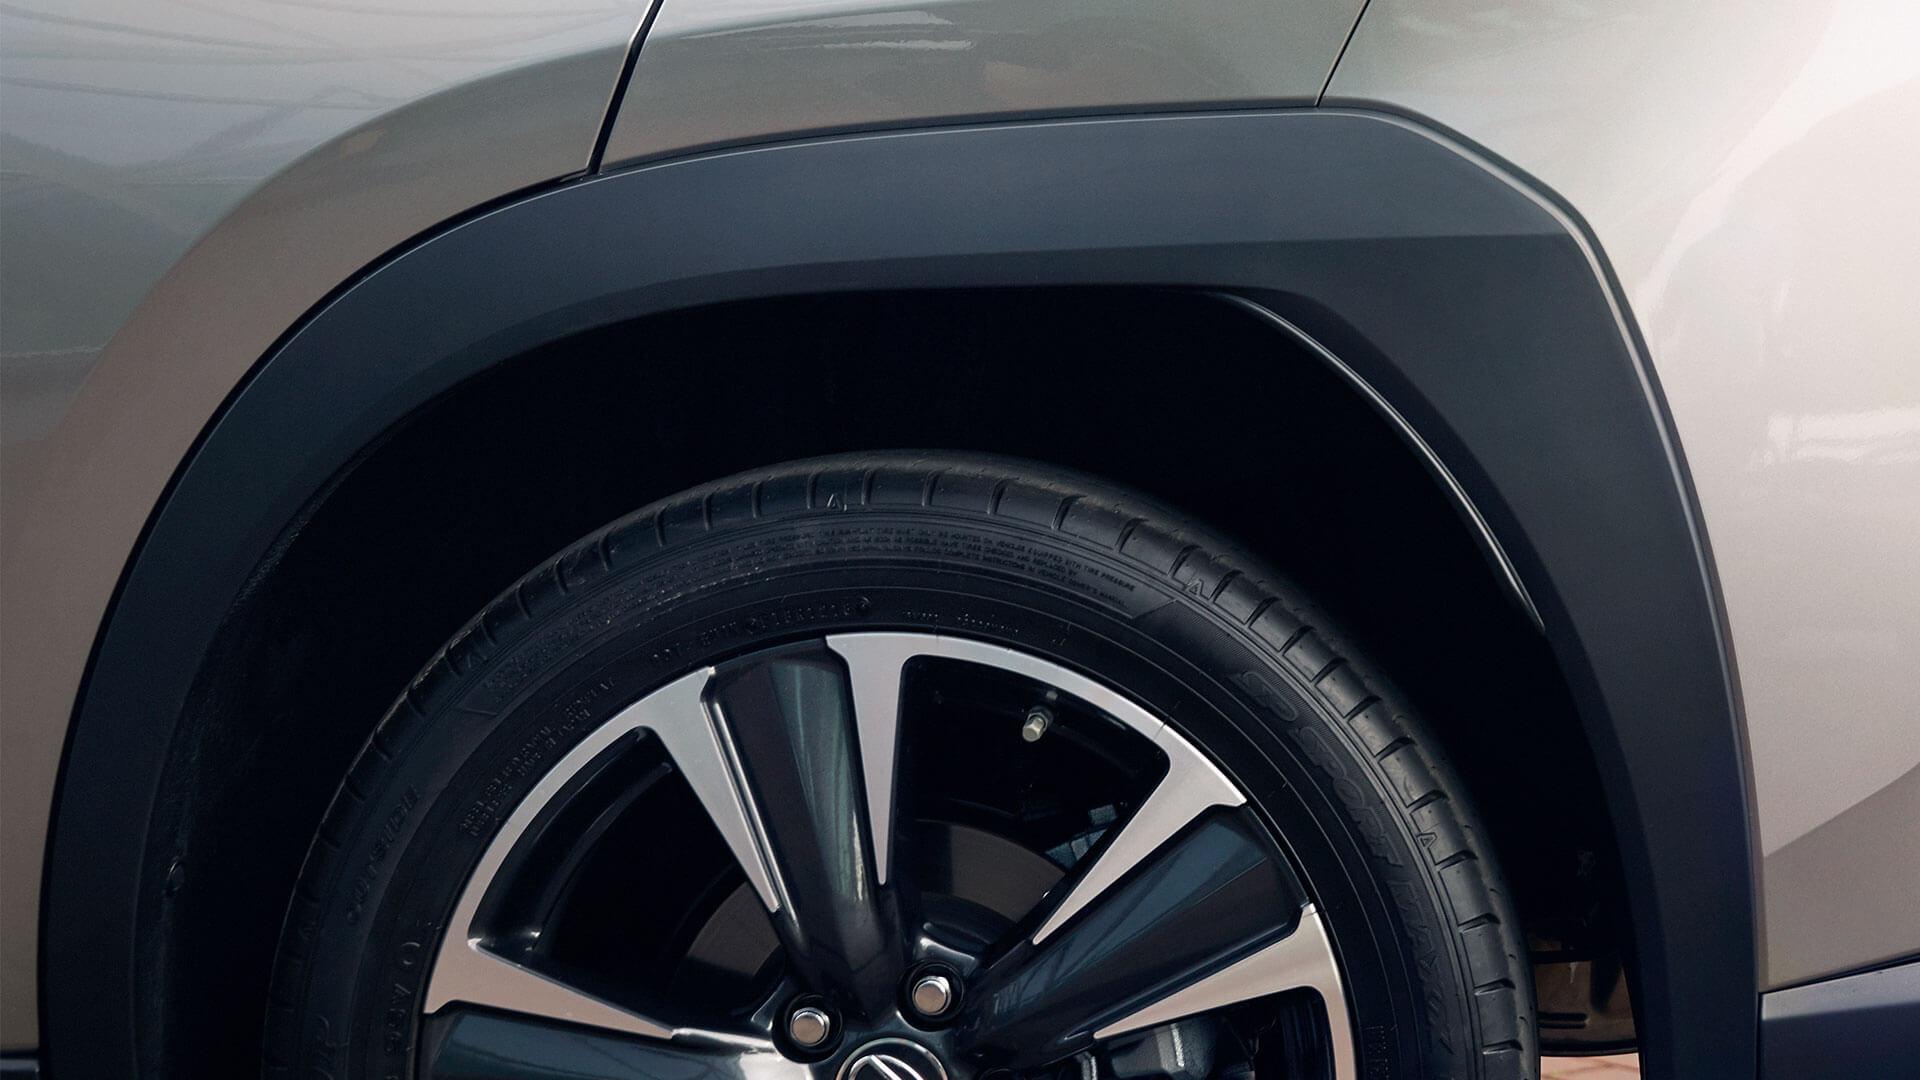 2019 lexus ux 250h experience hotspot stabilising wheels arch